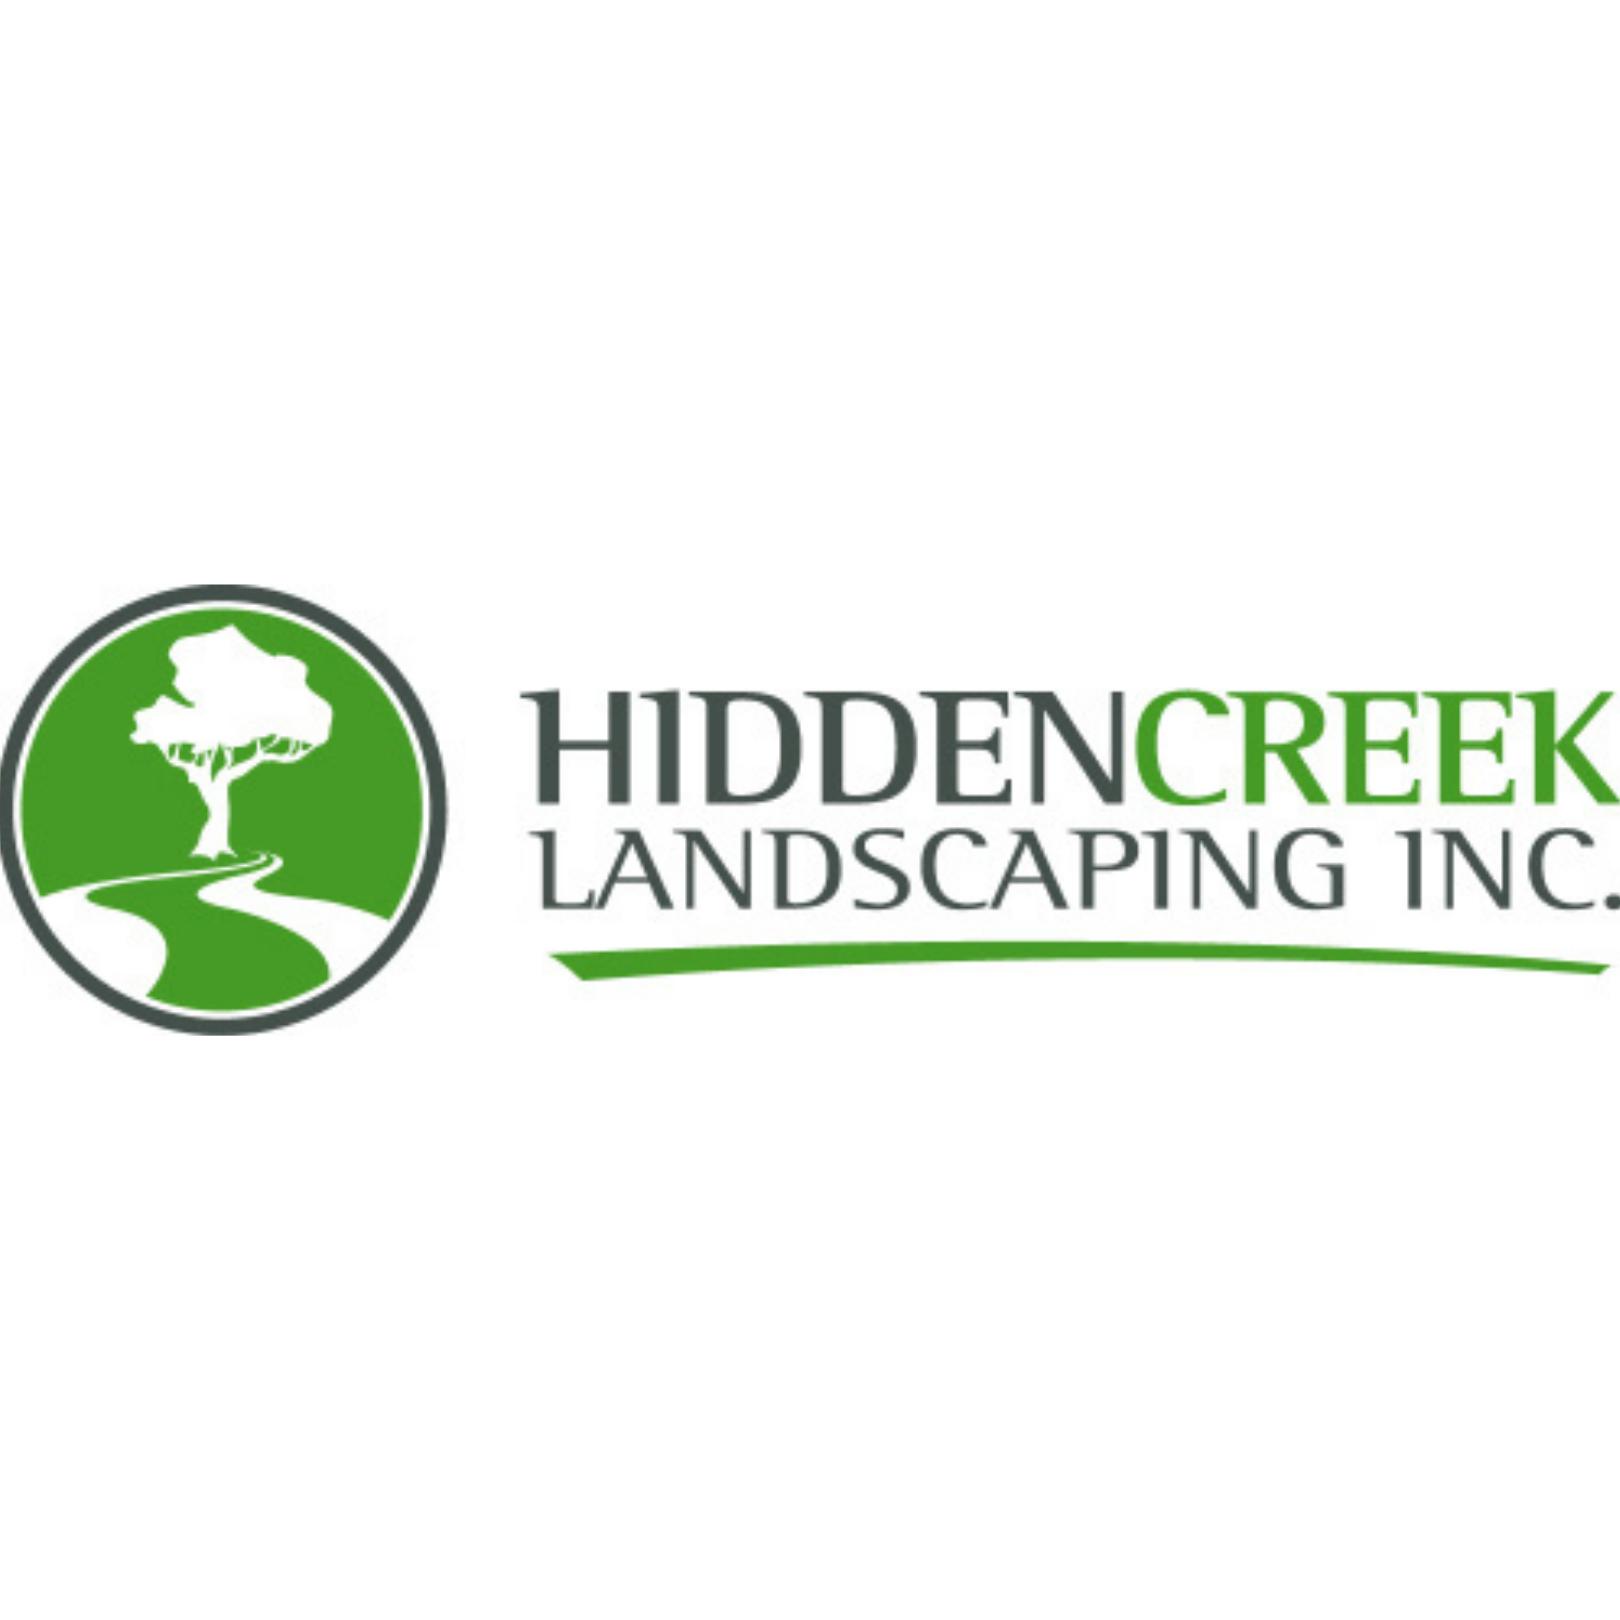 Hidden Creek Landscaping